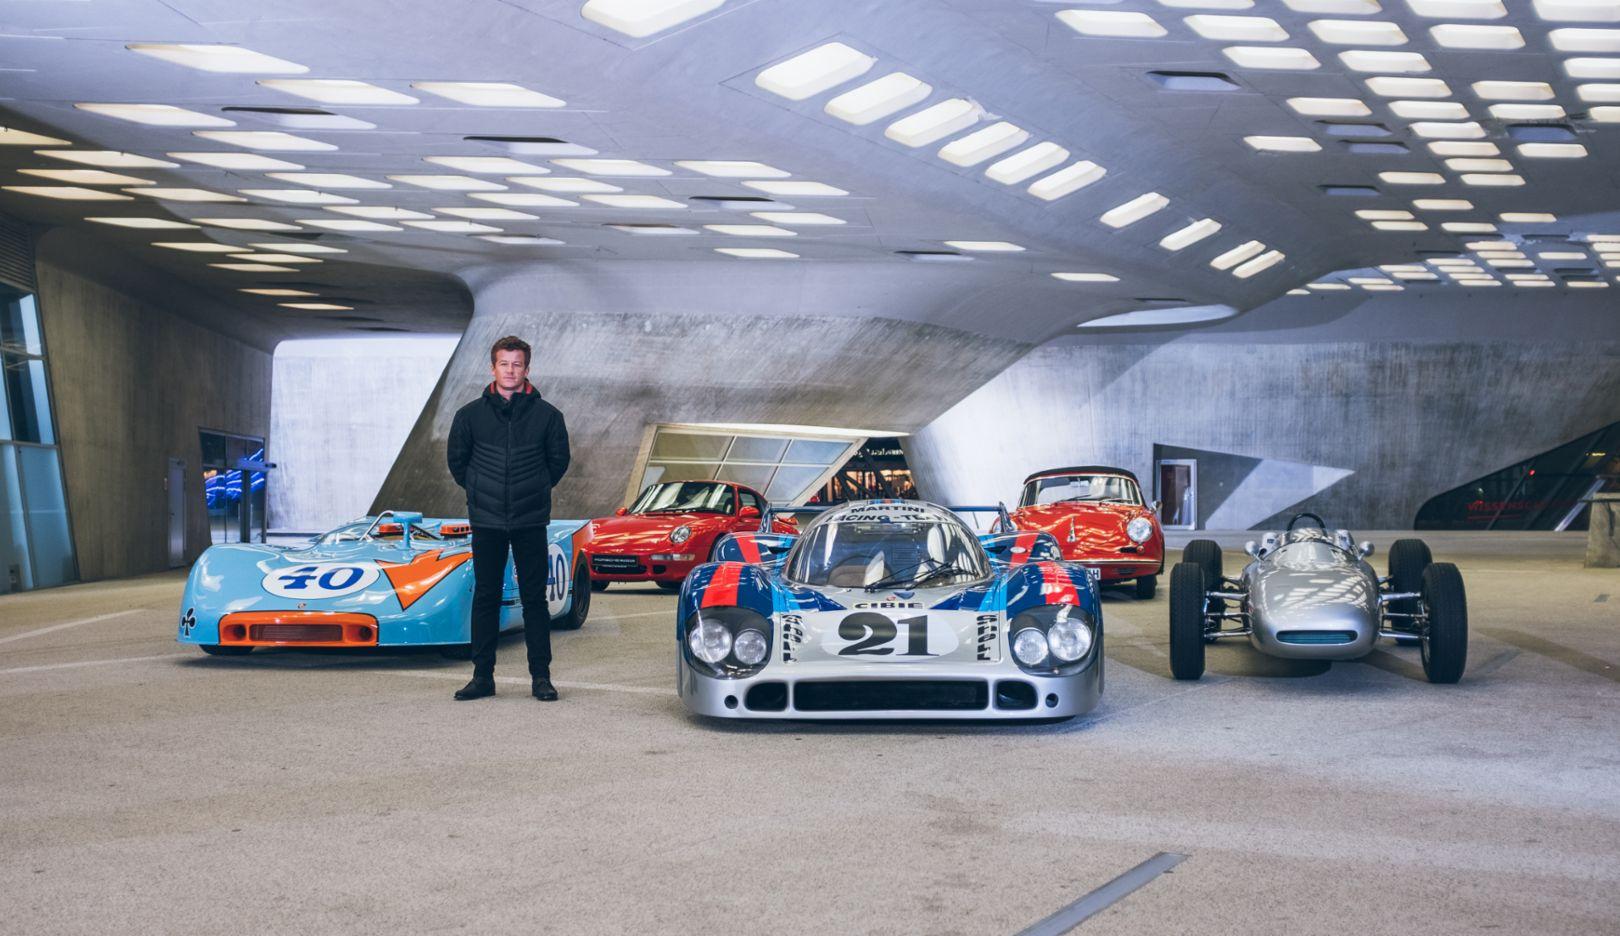 Patrick Long, Werksfahrer, 908/3 Spyder, 993 Turbo S 3.6., 917 LH (Langheck), 356 B GS Carrera GT, 804 Formel 1 Rennwagen, 2018, Porsche AG